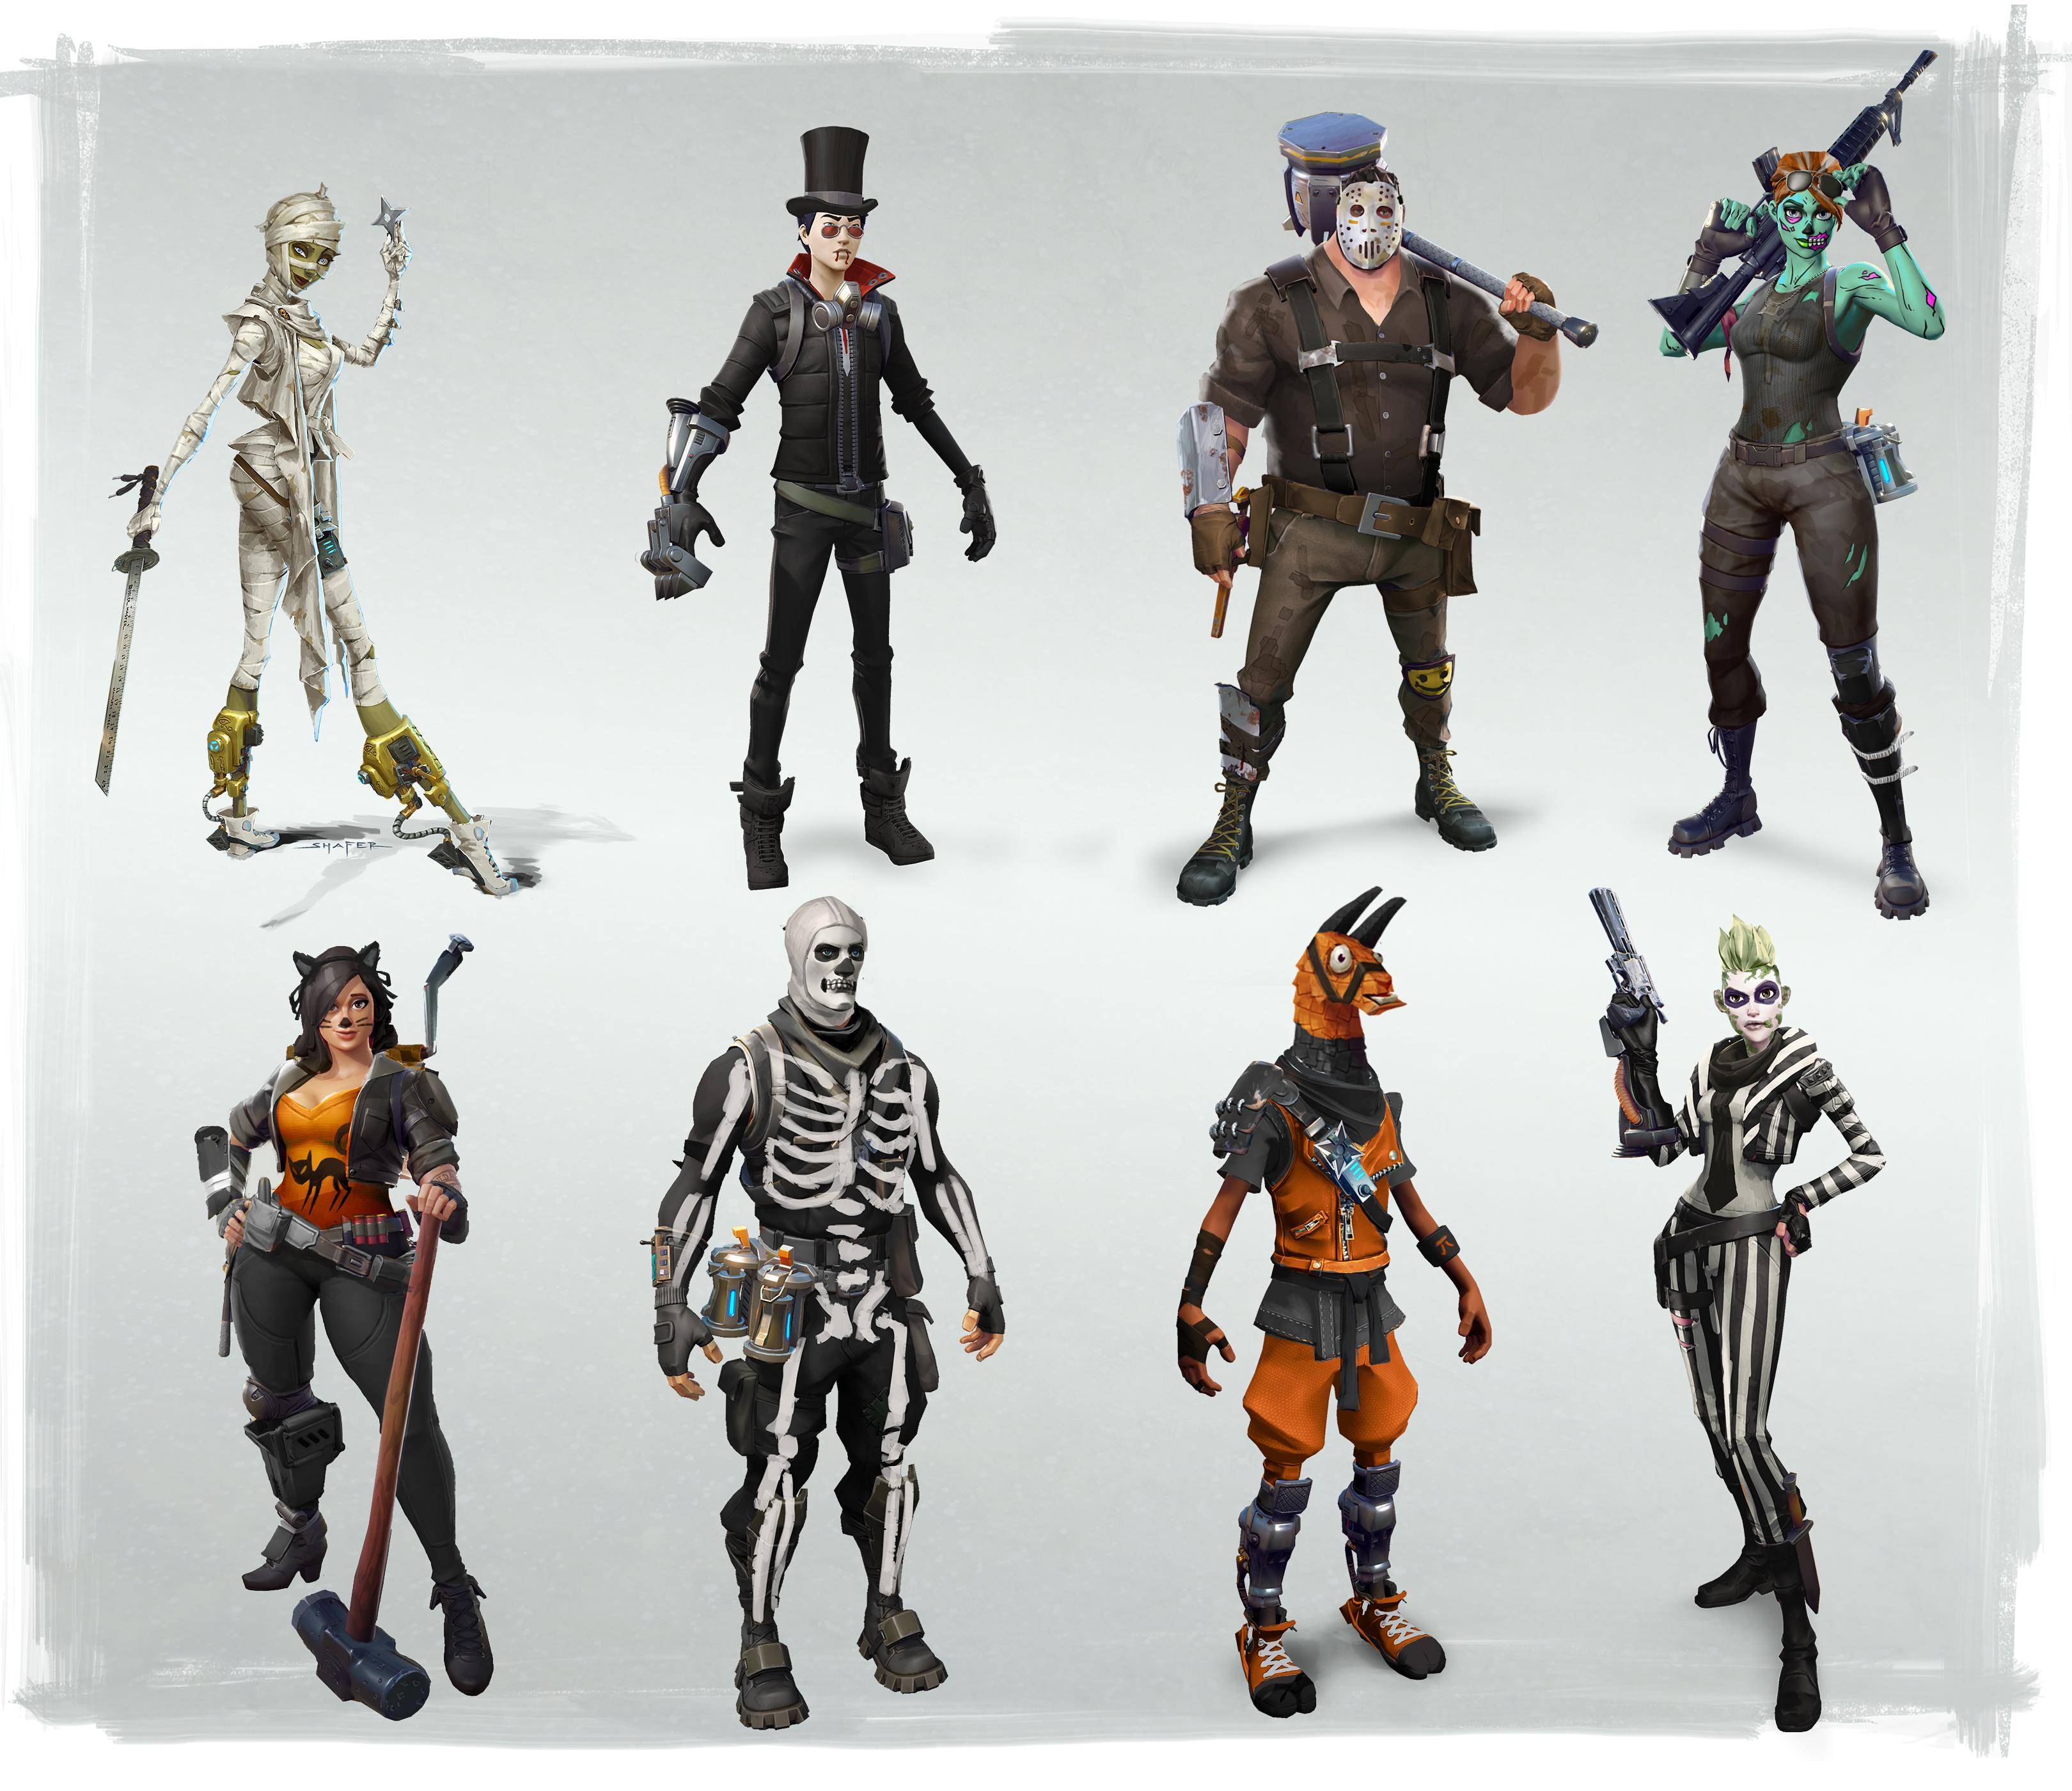 Halloween Fortnite.Fortnitemares Halloween Event Arrives To Fortnite